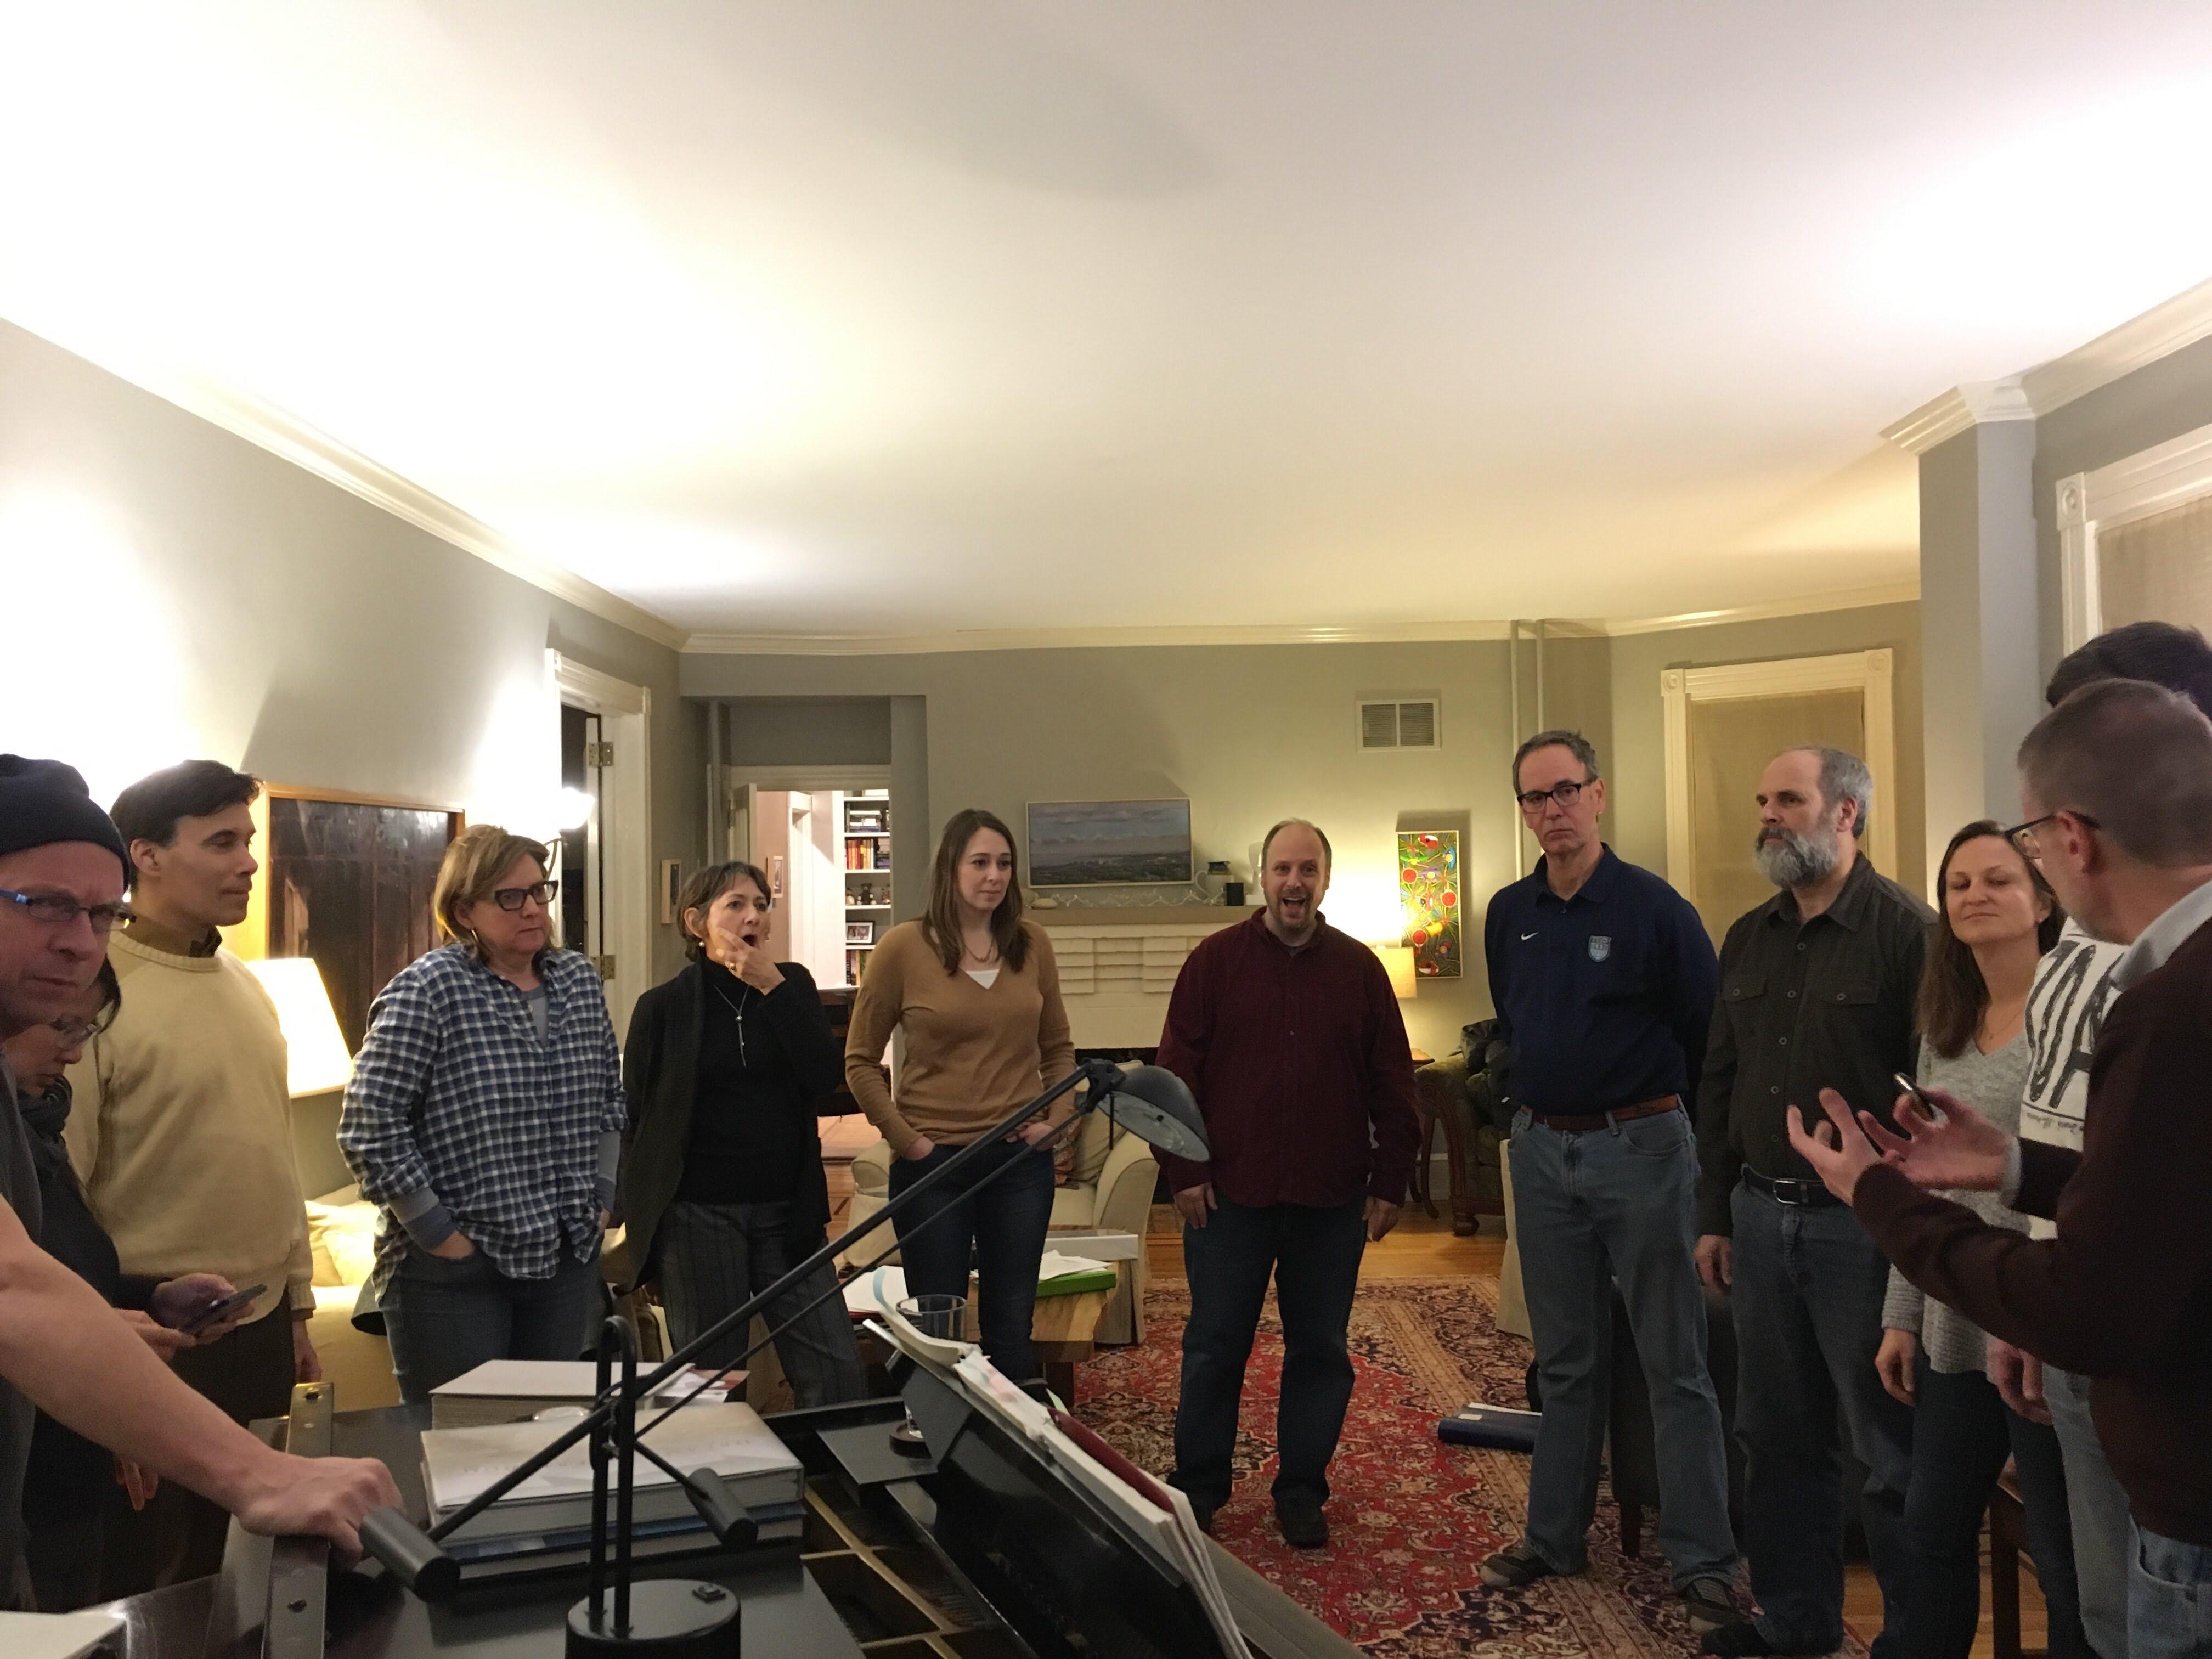 Rehearsal, 2018